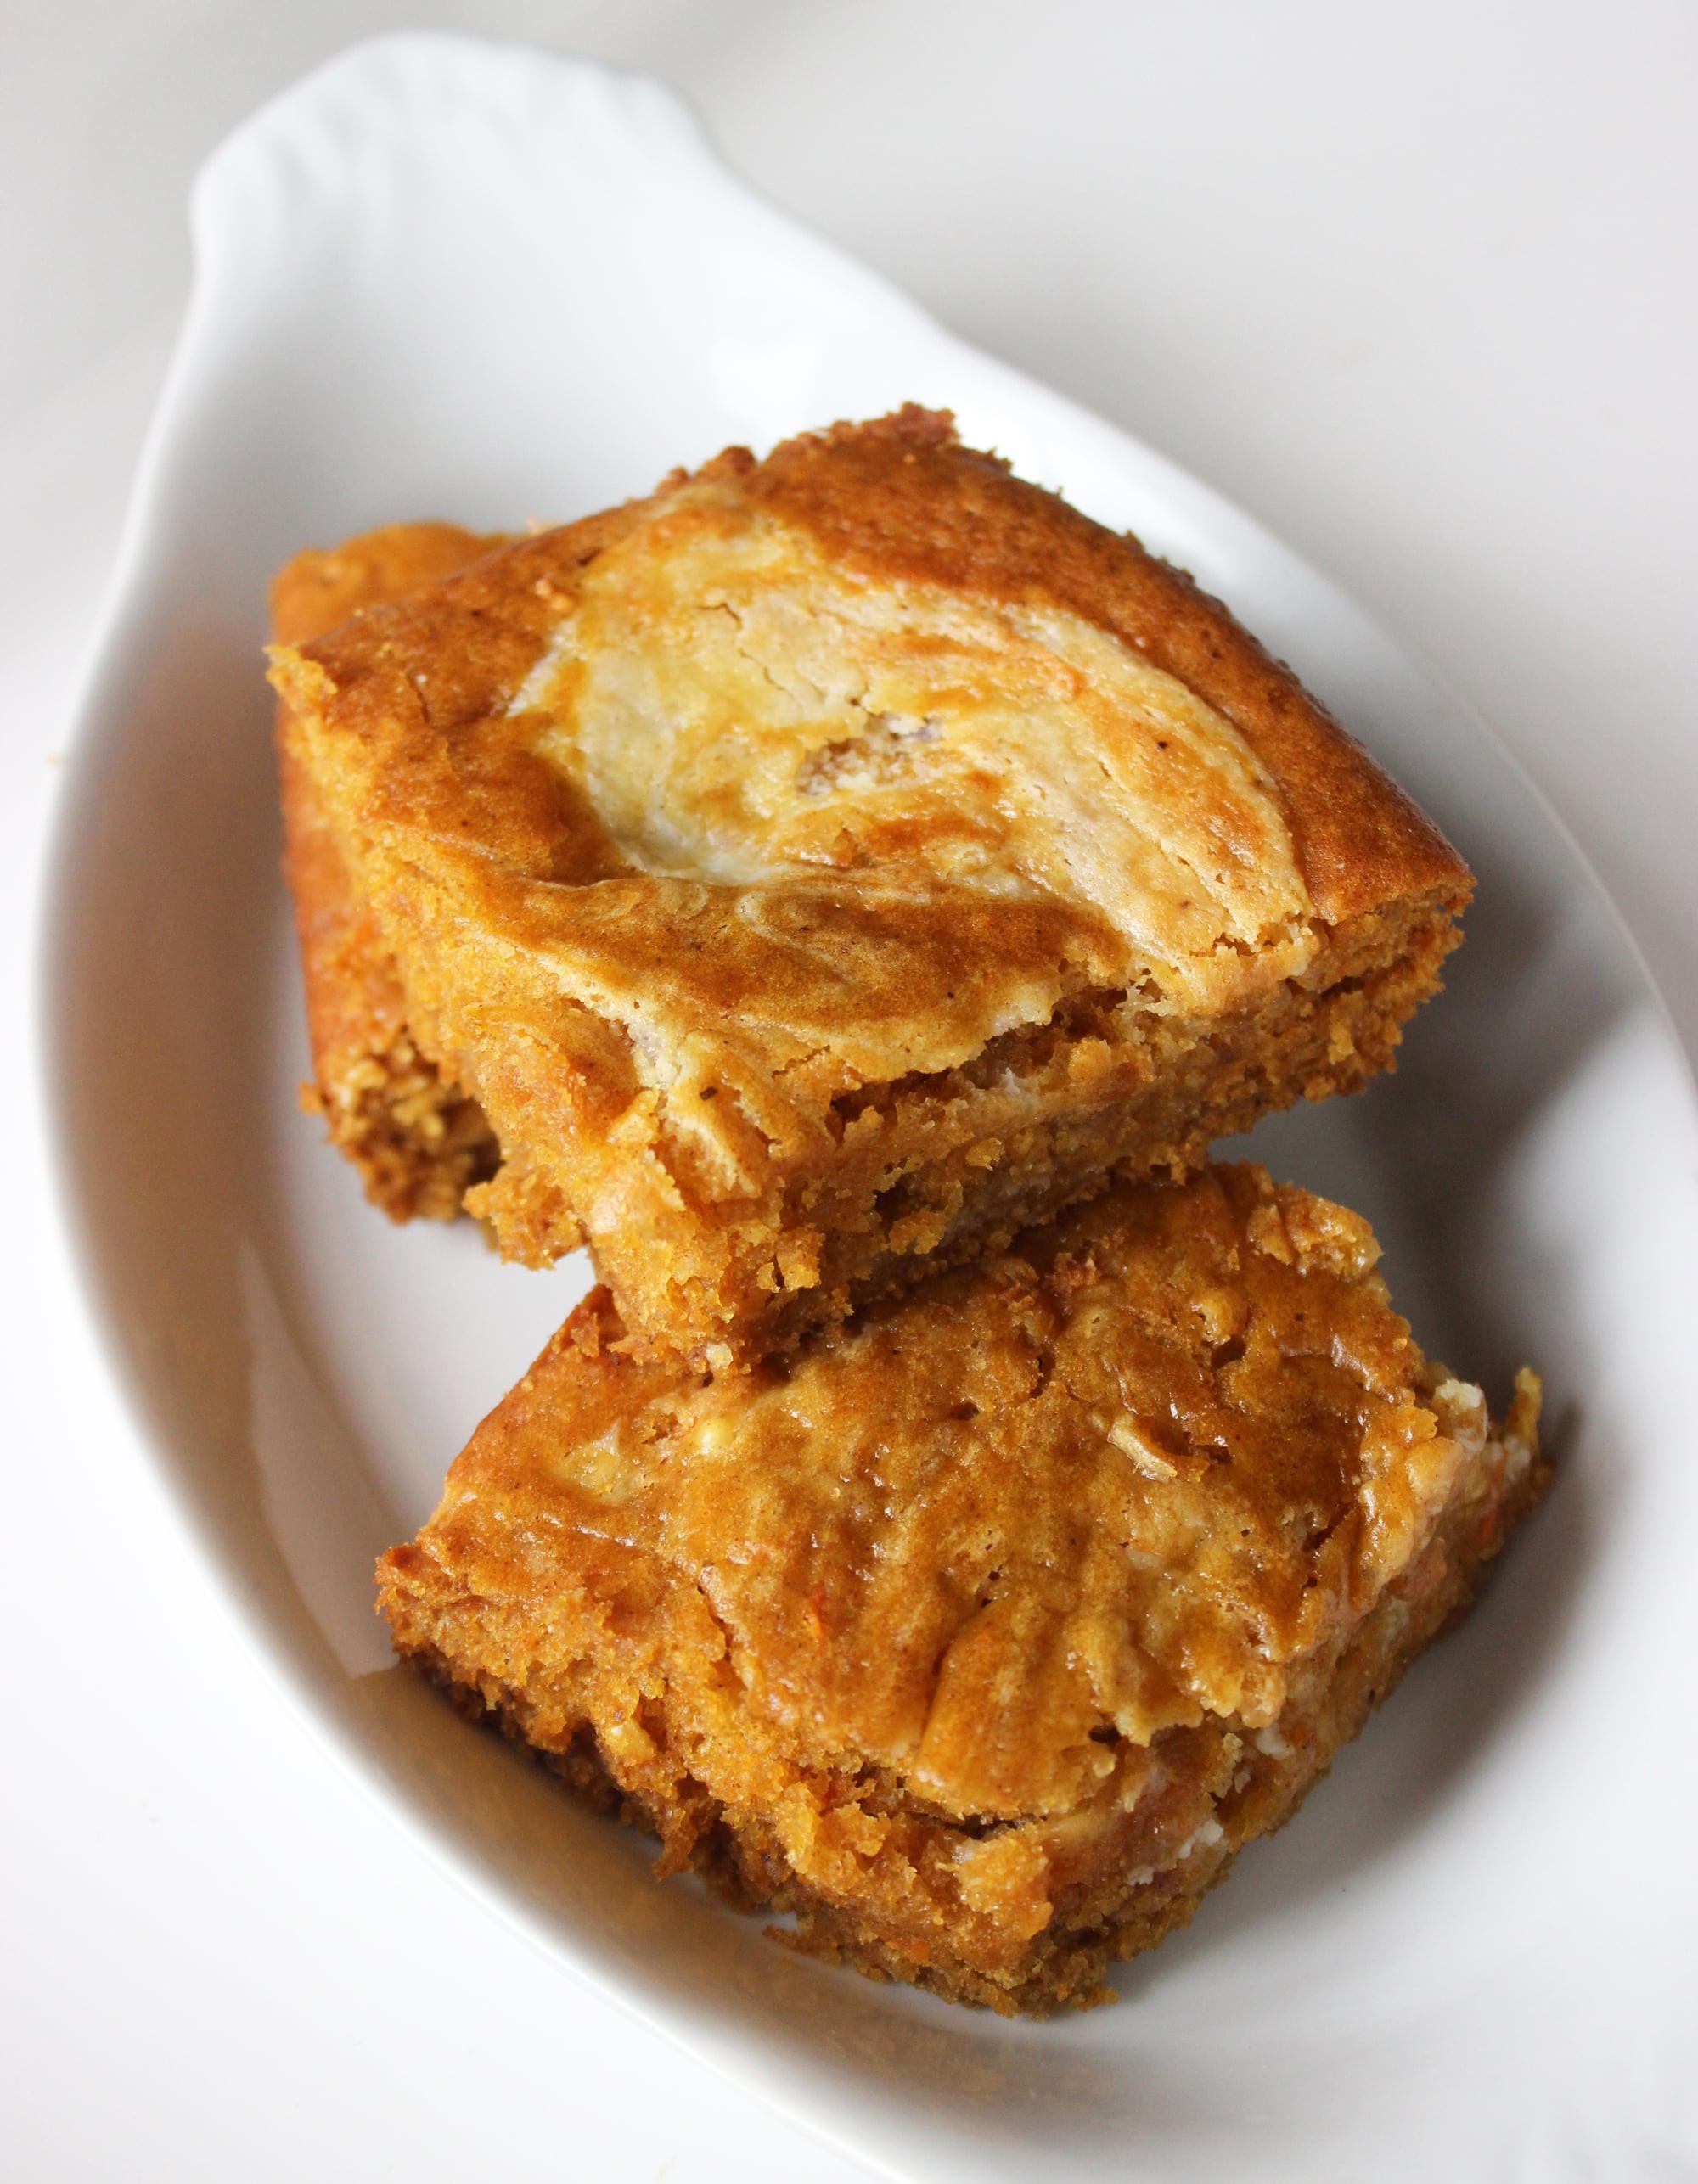 Pumpkin Recipes Healthy  Healthy Dessert Pumpkin Carrot Bars With Cream Cheese